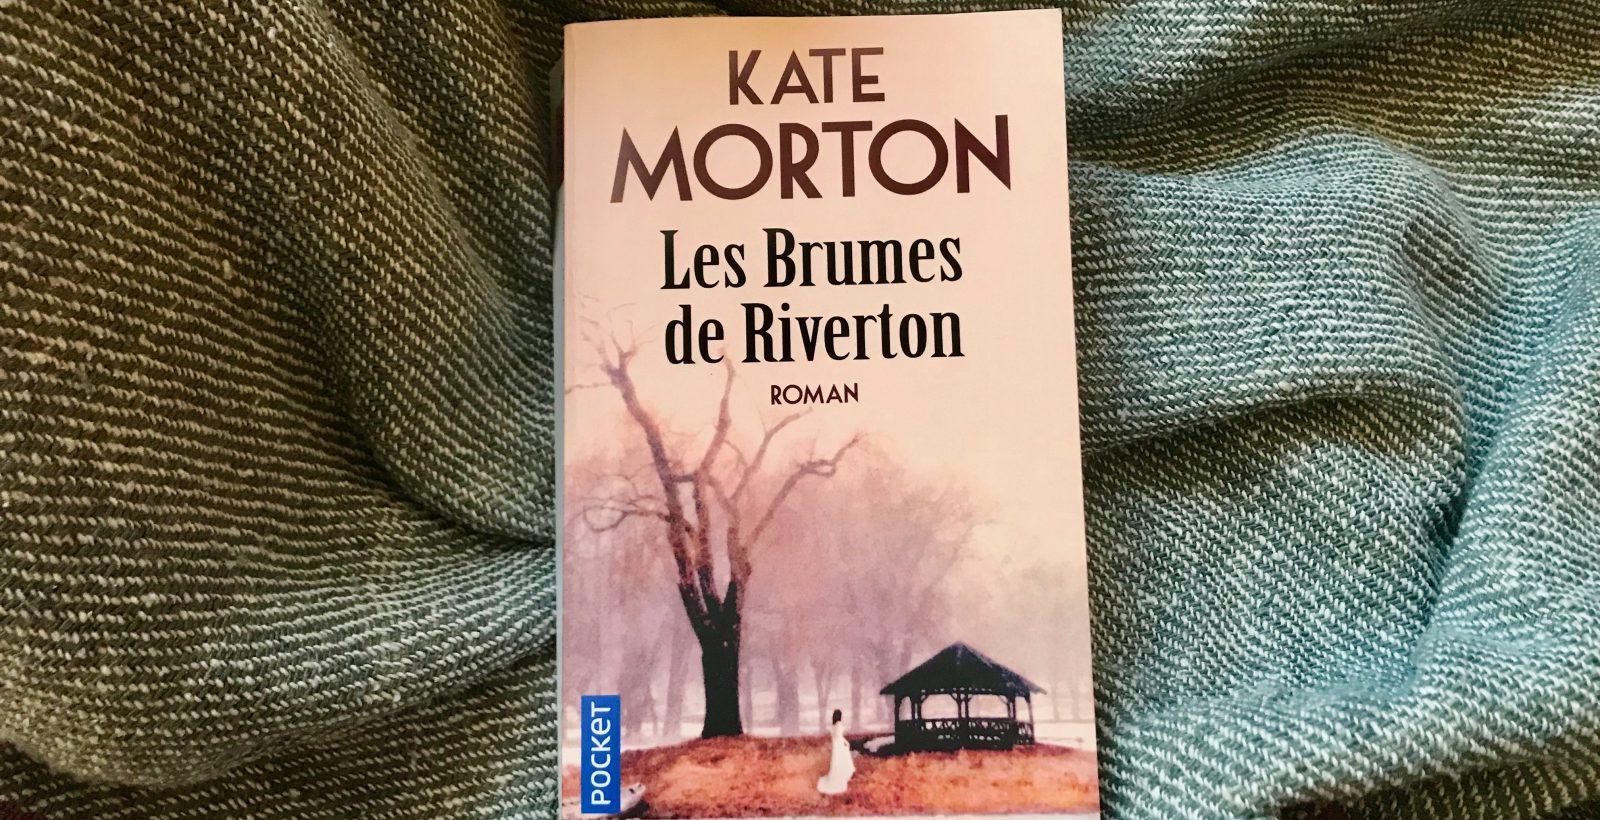 Les brumes de Riverton.Kate Morton